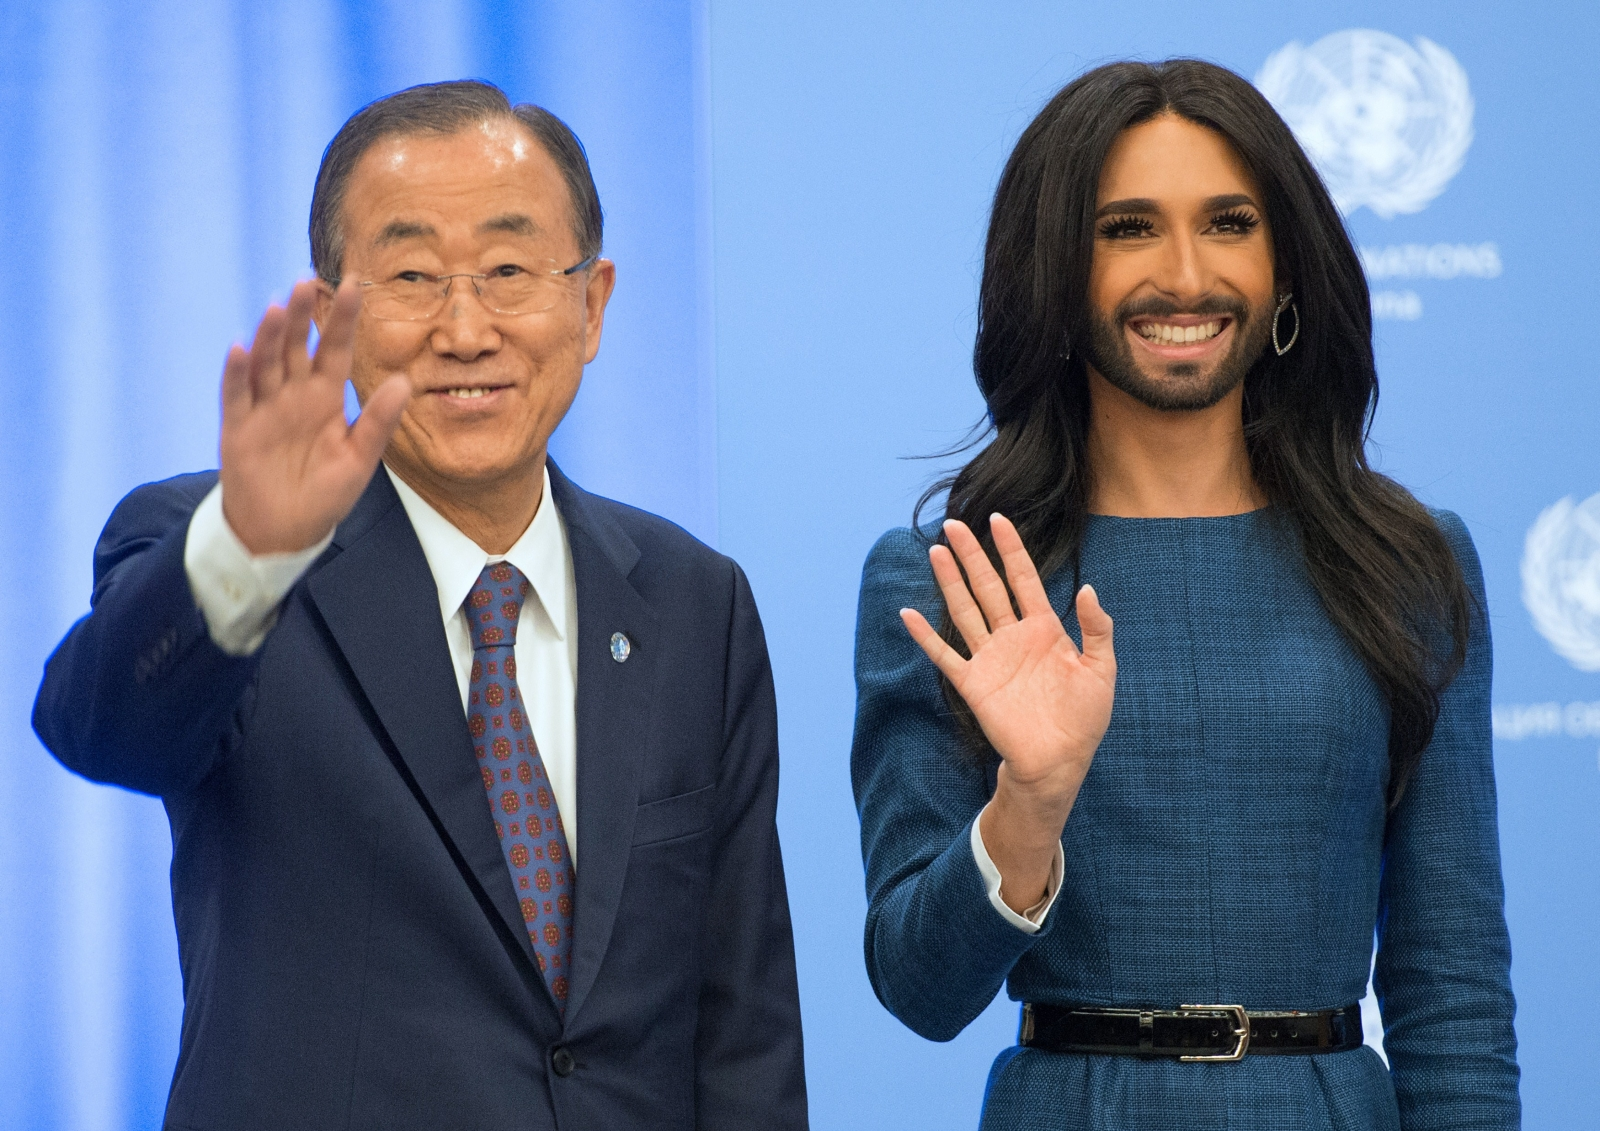 Ban ki Moon and Conchita Wurst